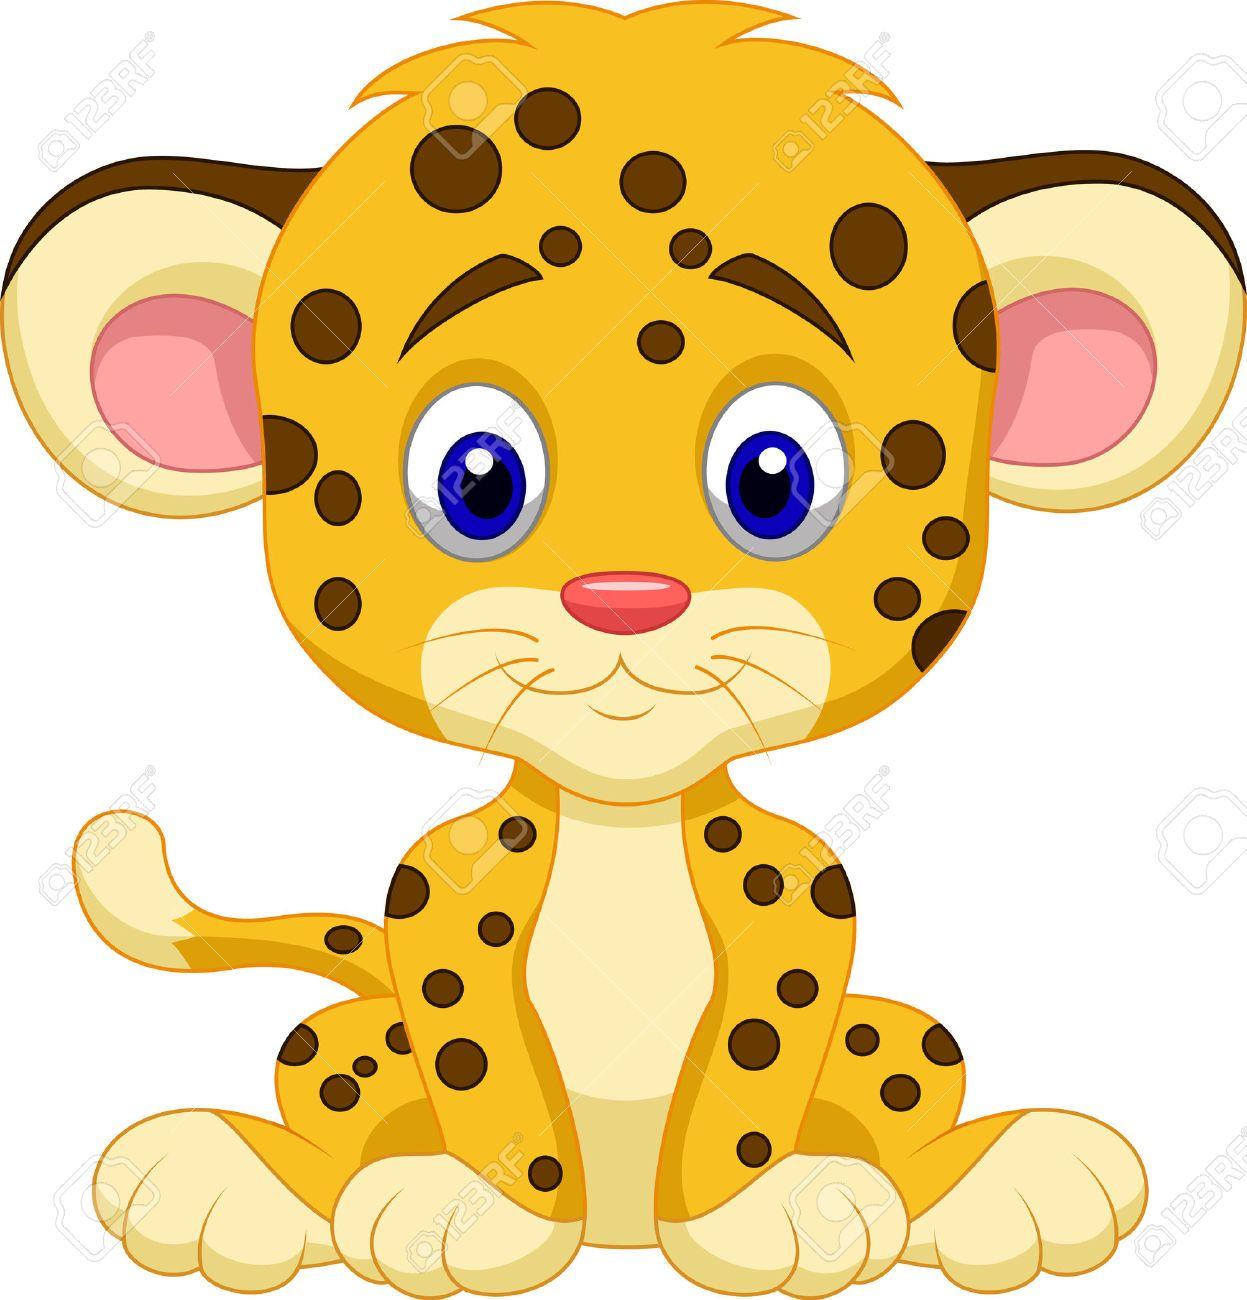 Safari jungle animals clip art and safari animals - Beb 233 Leopardo De Dibujos Animados Ilustraciones